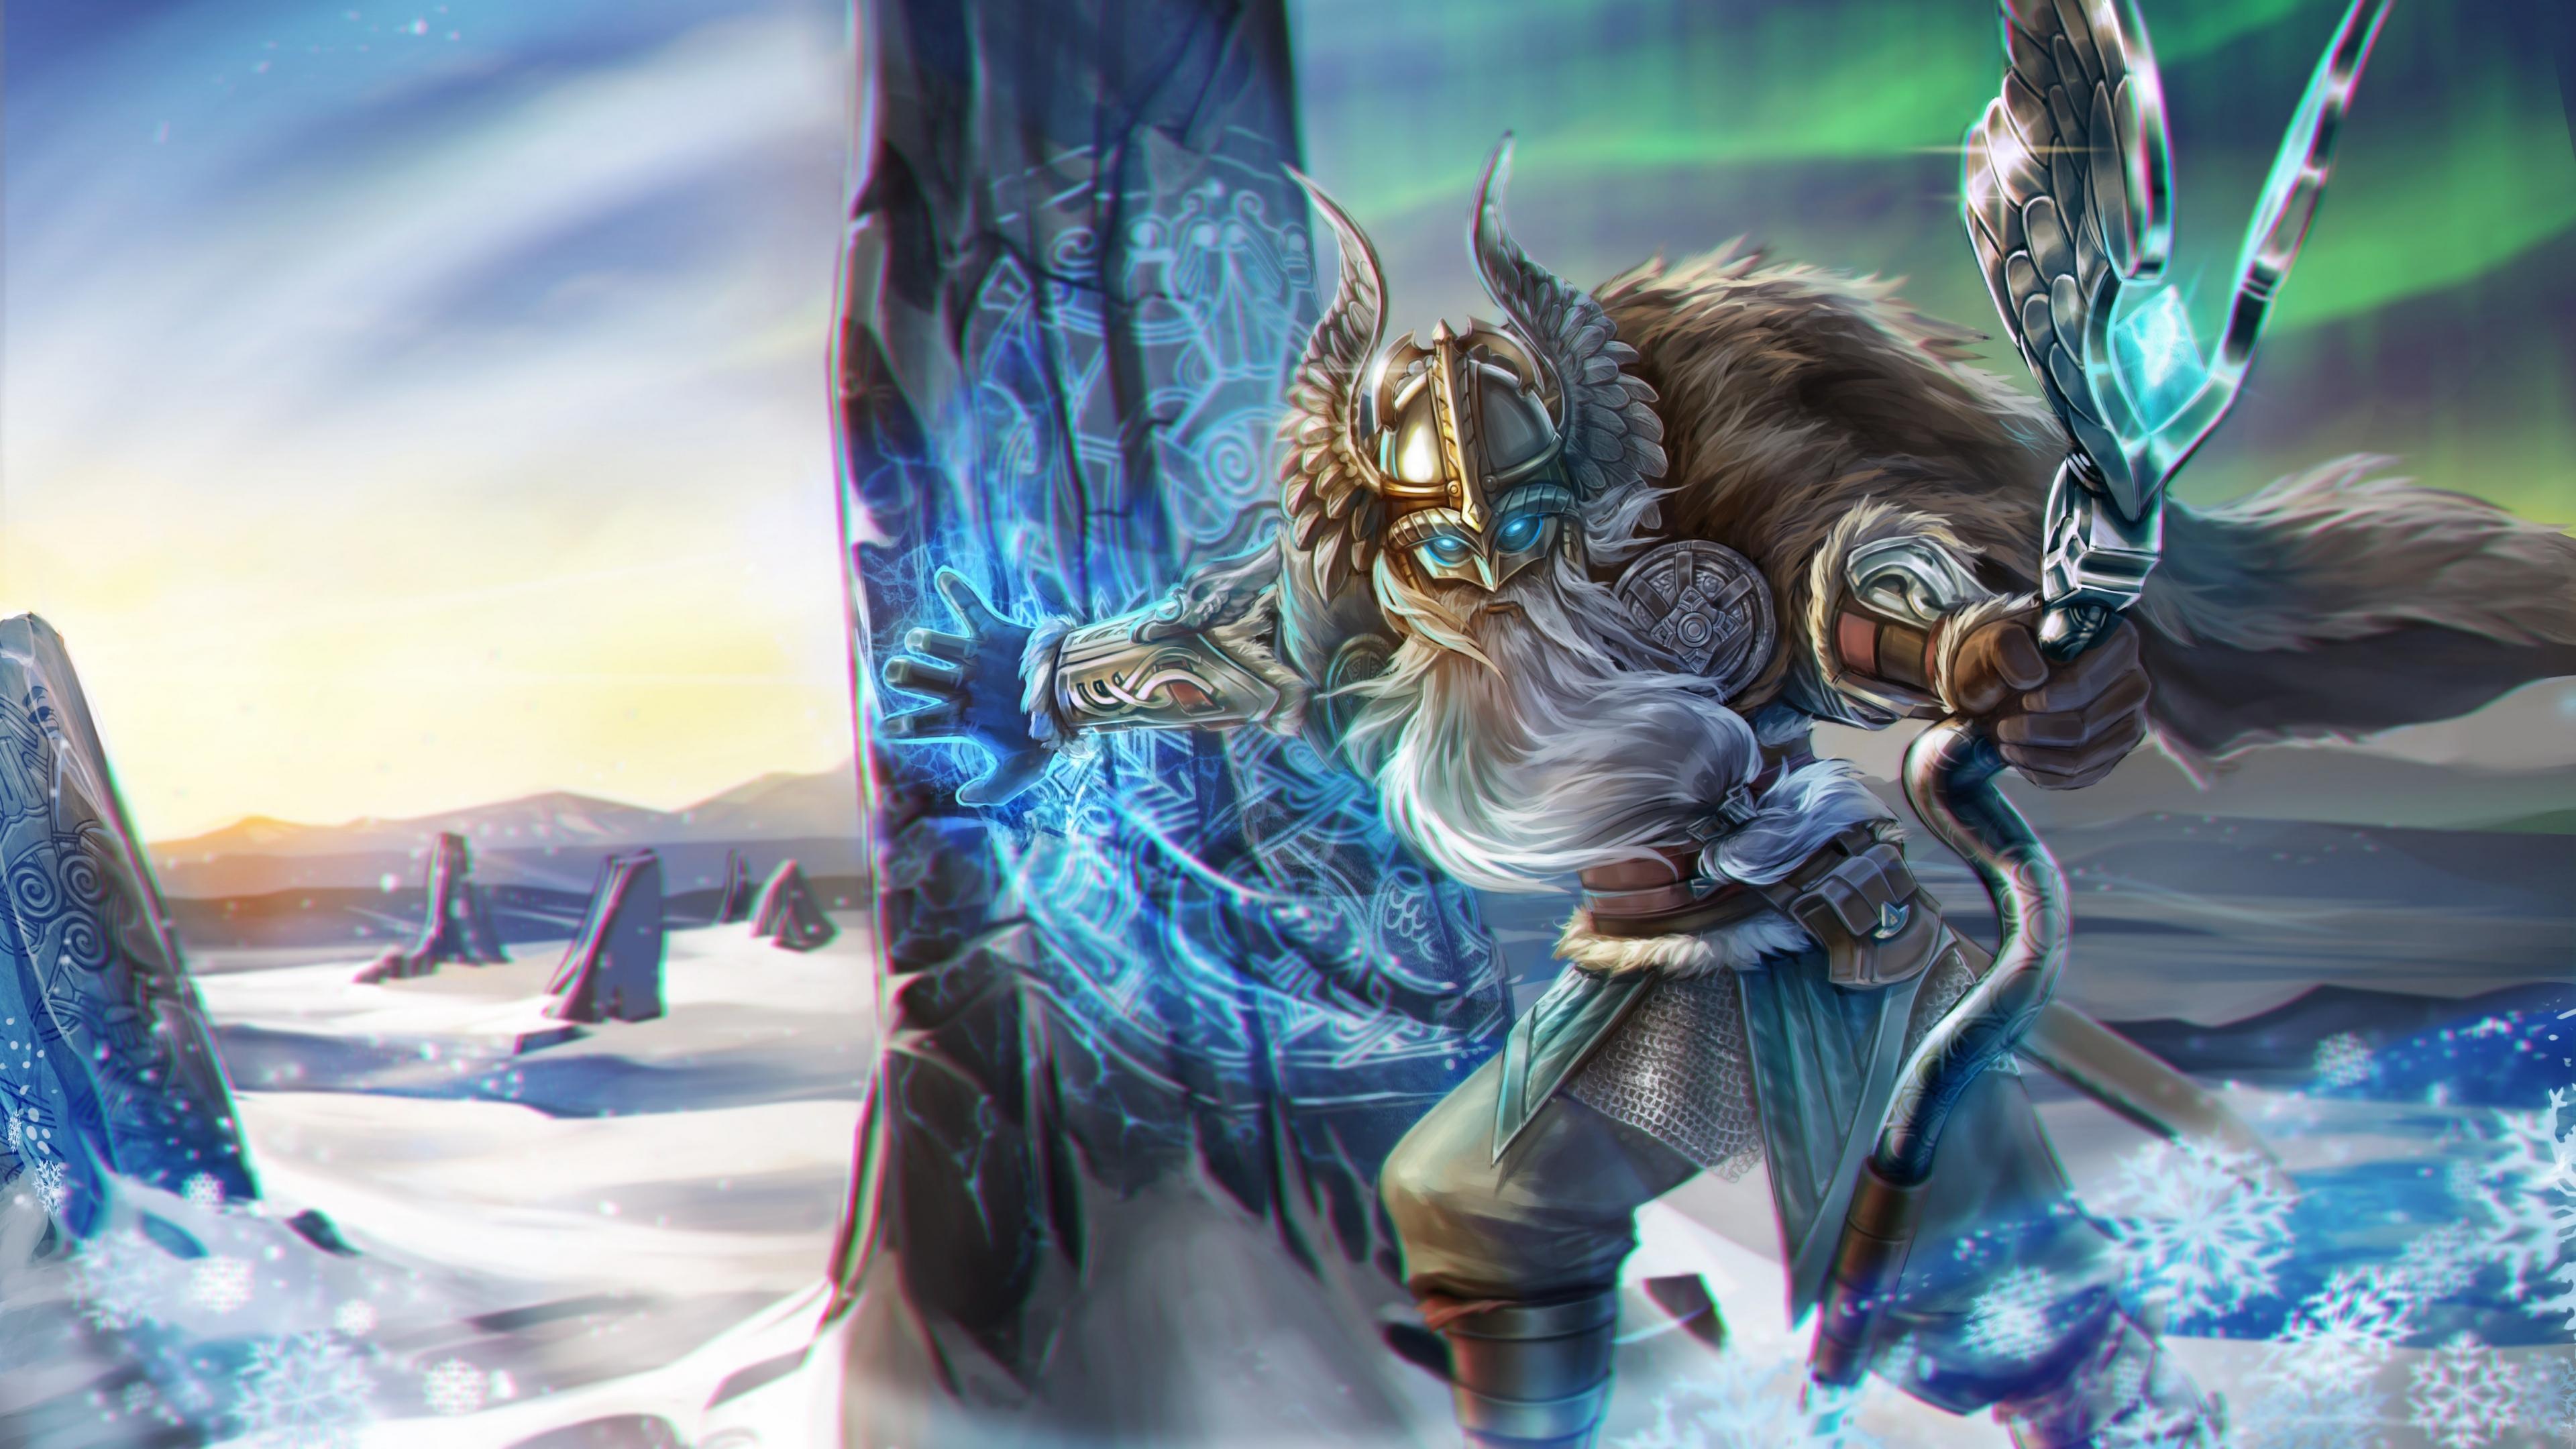 Desktop Wallpaper Viking Reim Vainglory Warrior 4k Hd Image Picture Background 976bb9